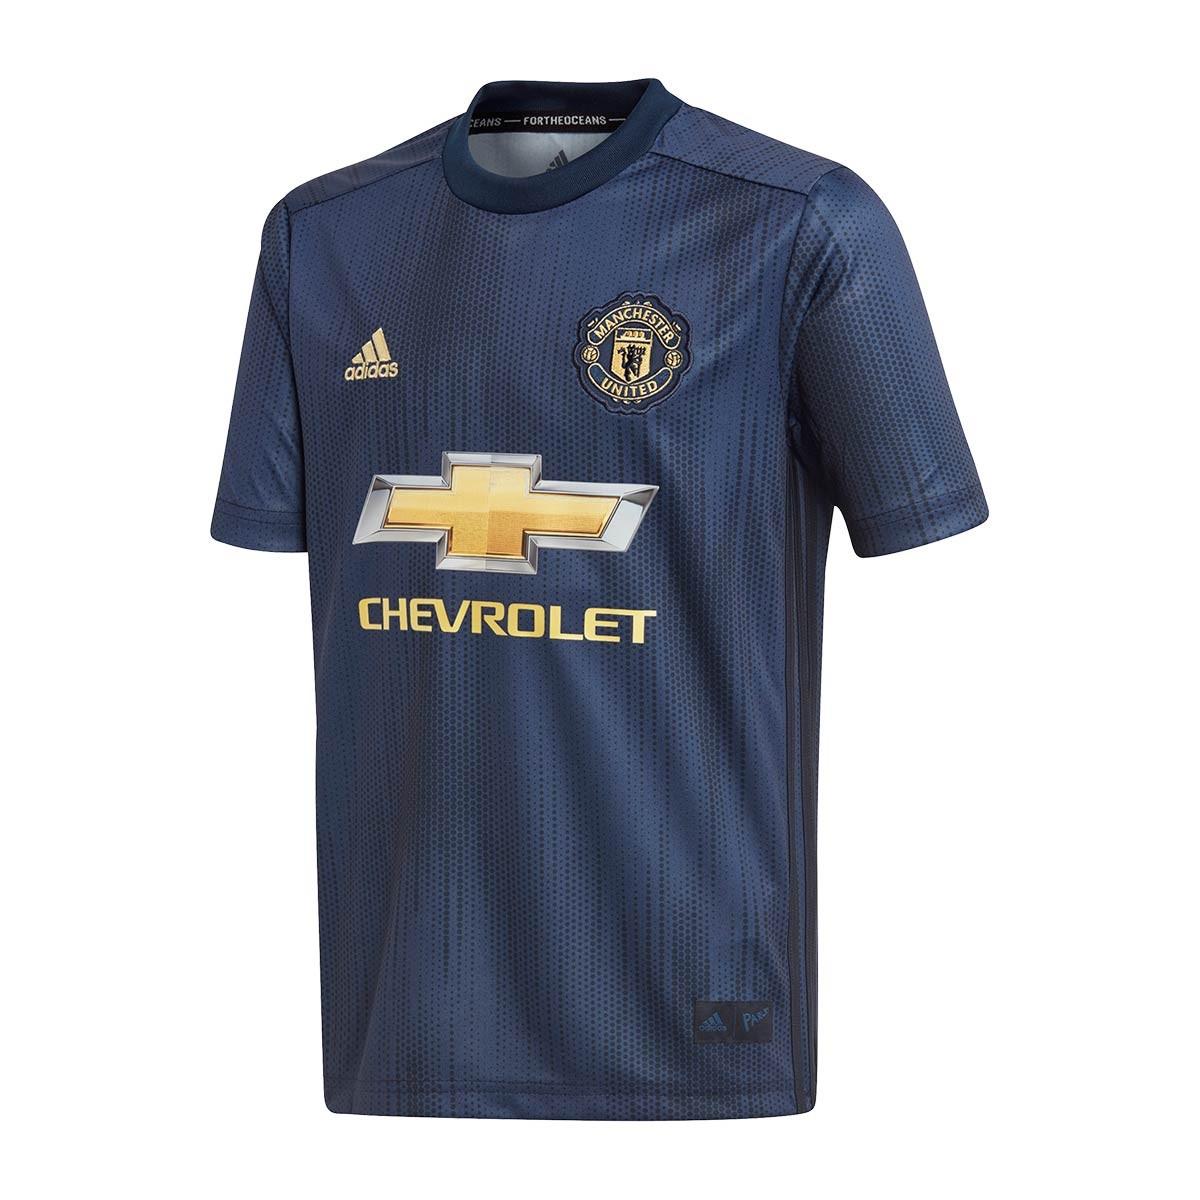 Maglia adidas Manchester United FC Terza Divisa 2018-2019 Junior